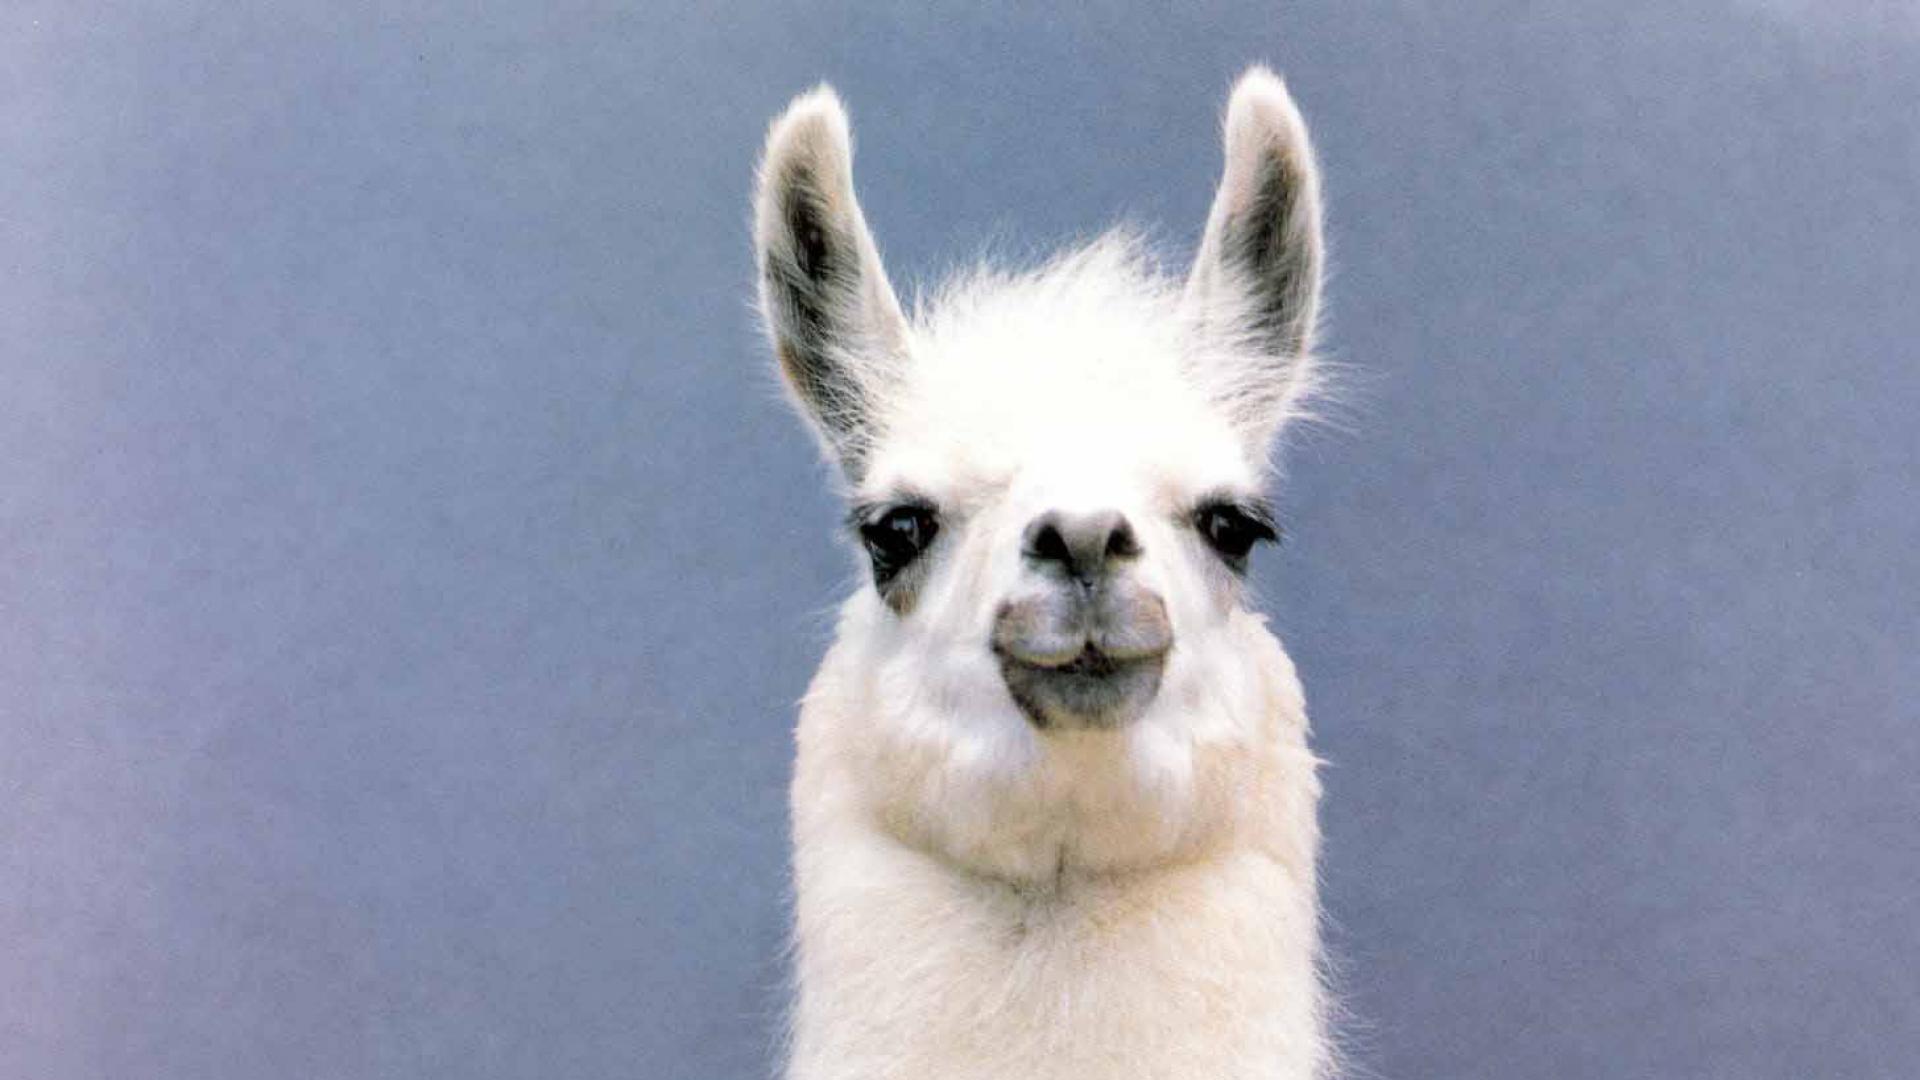 Images of Llama | 1920x1080